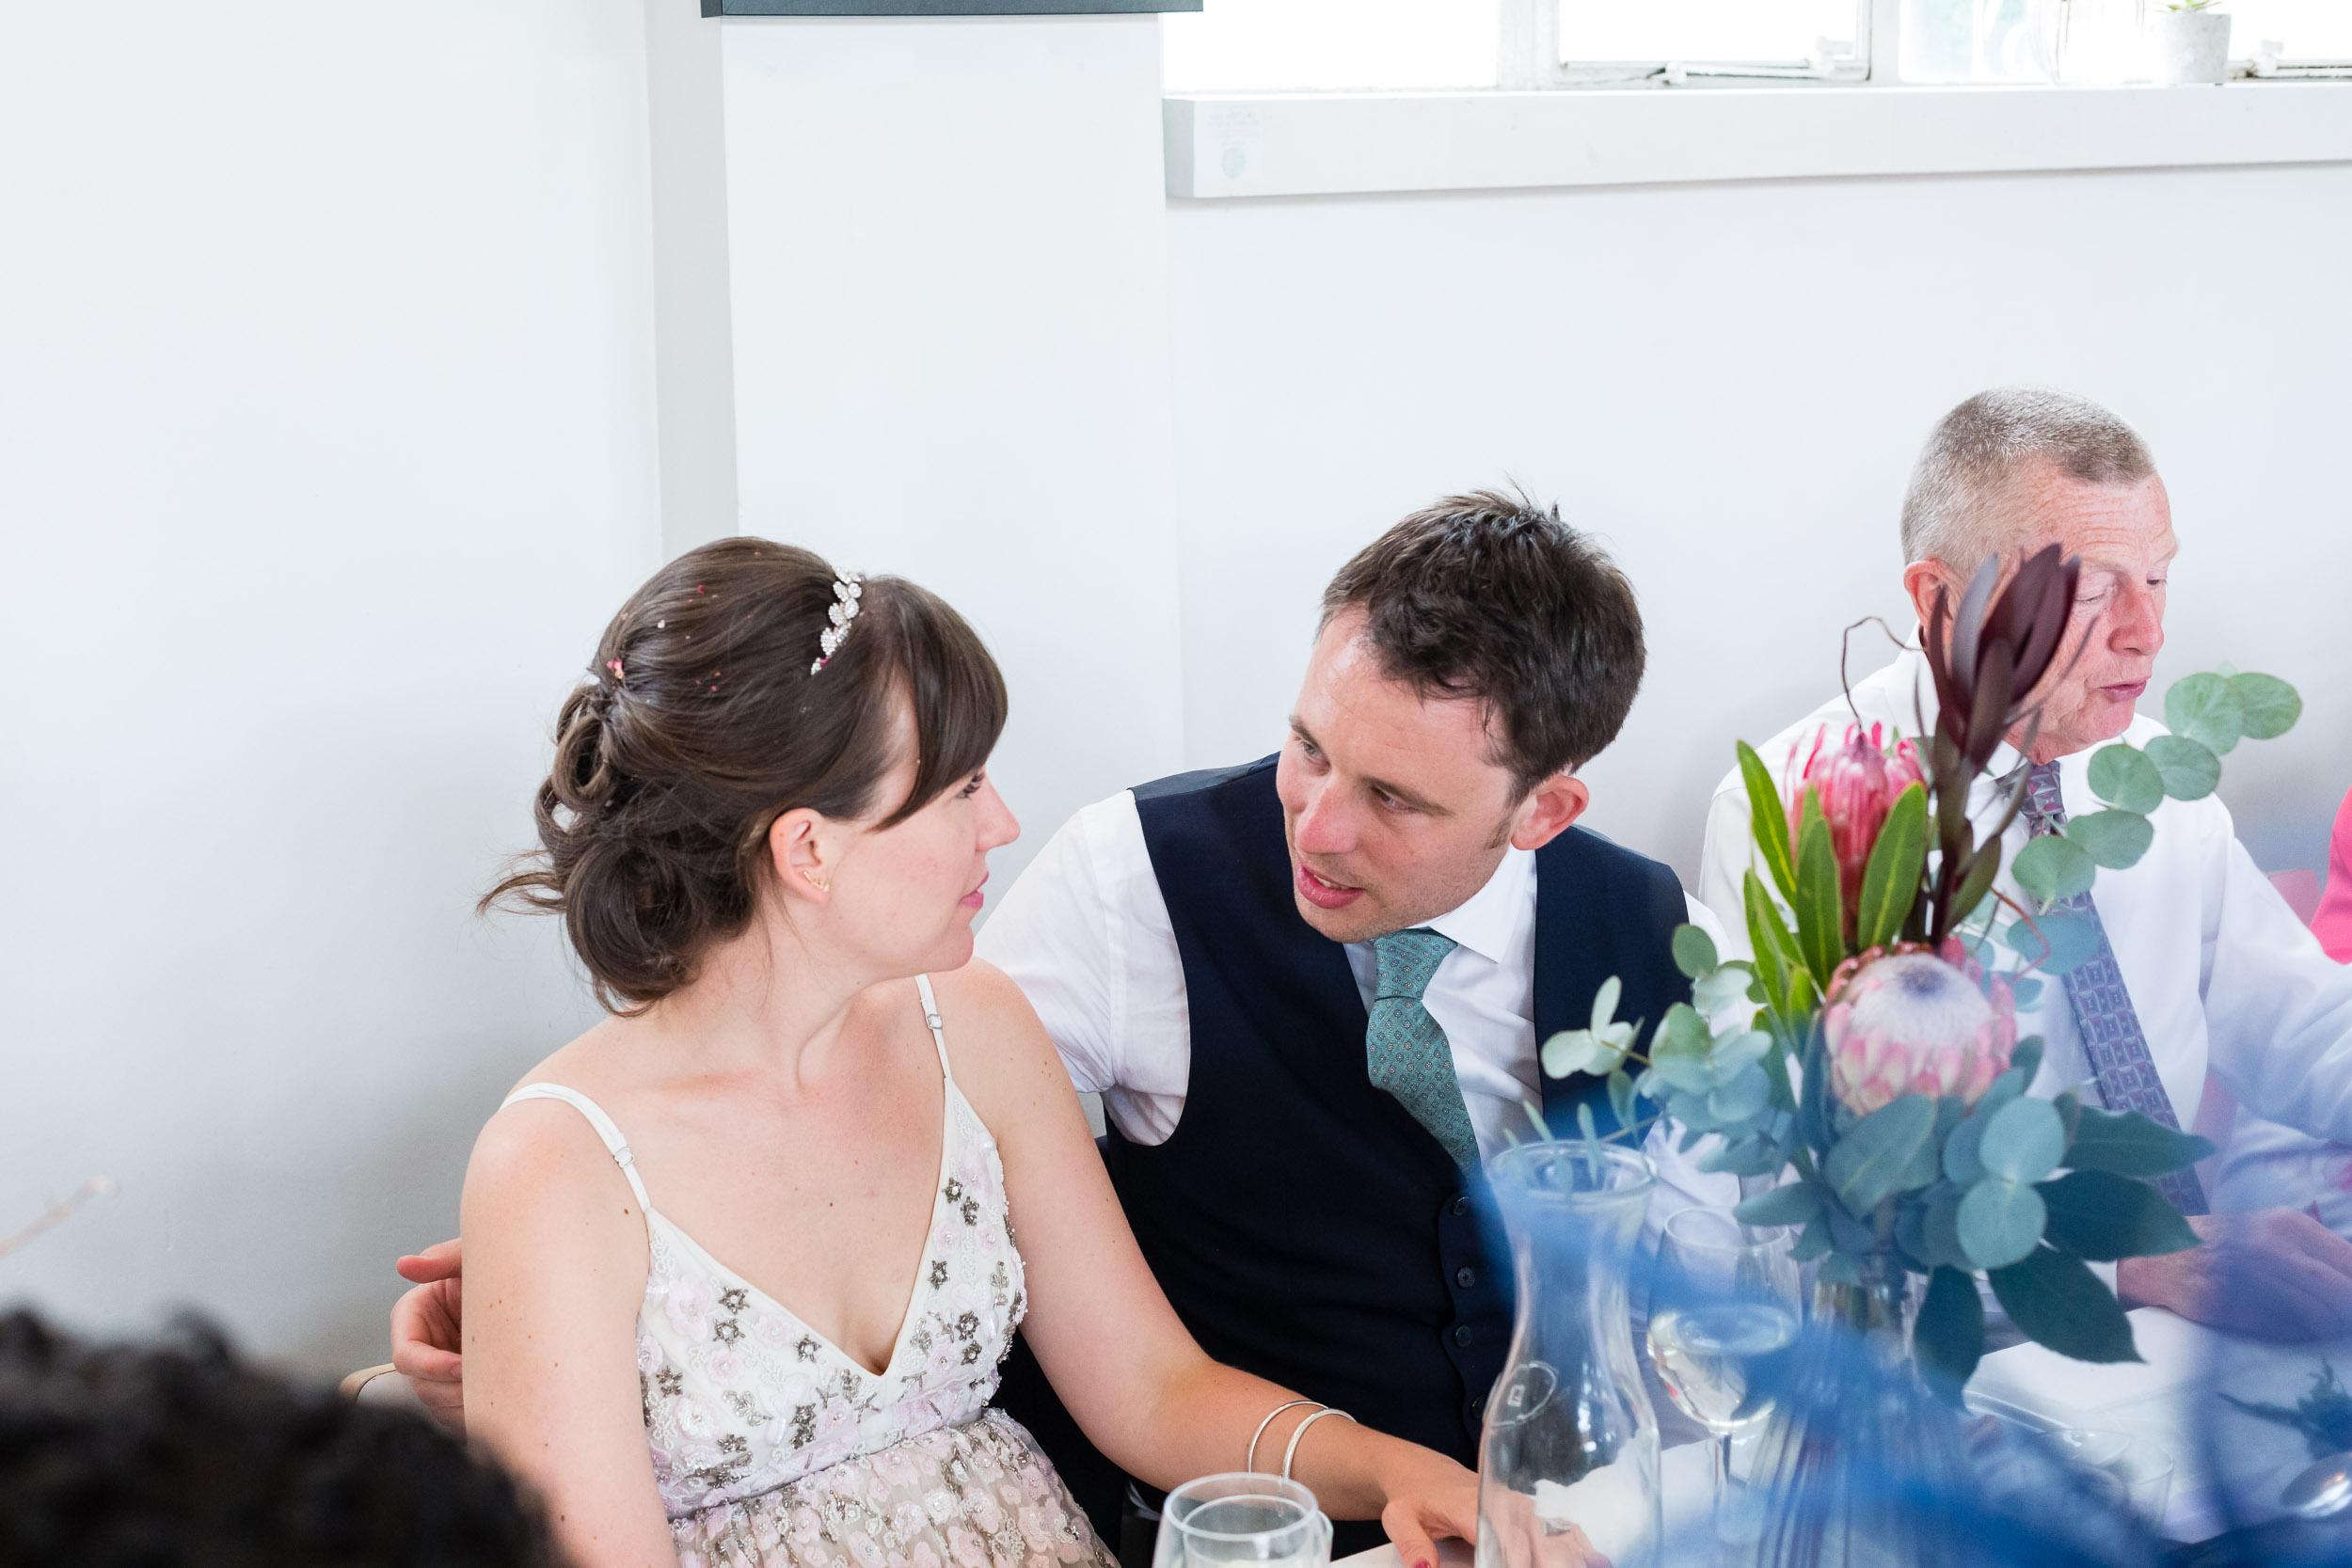 brockwell-lido-brixton-herne-hill-wedding-316.jpg